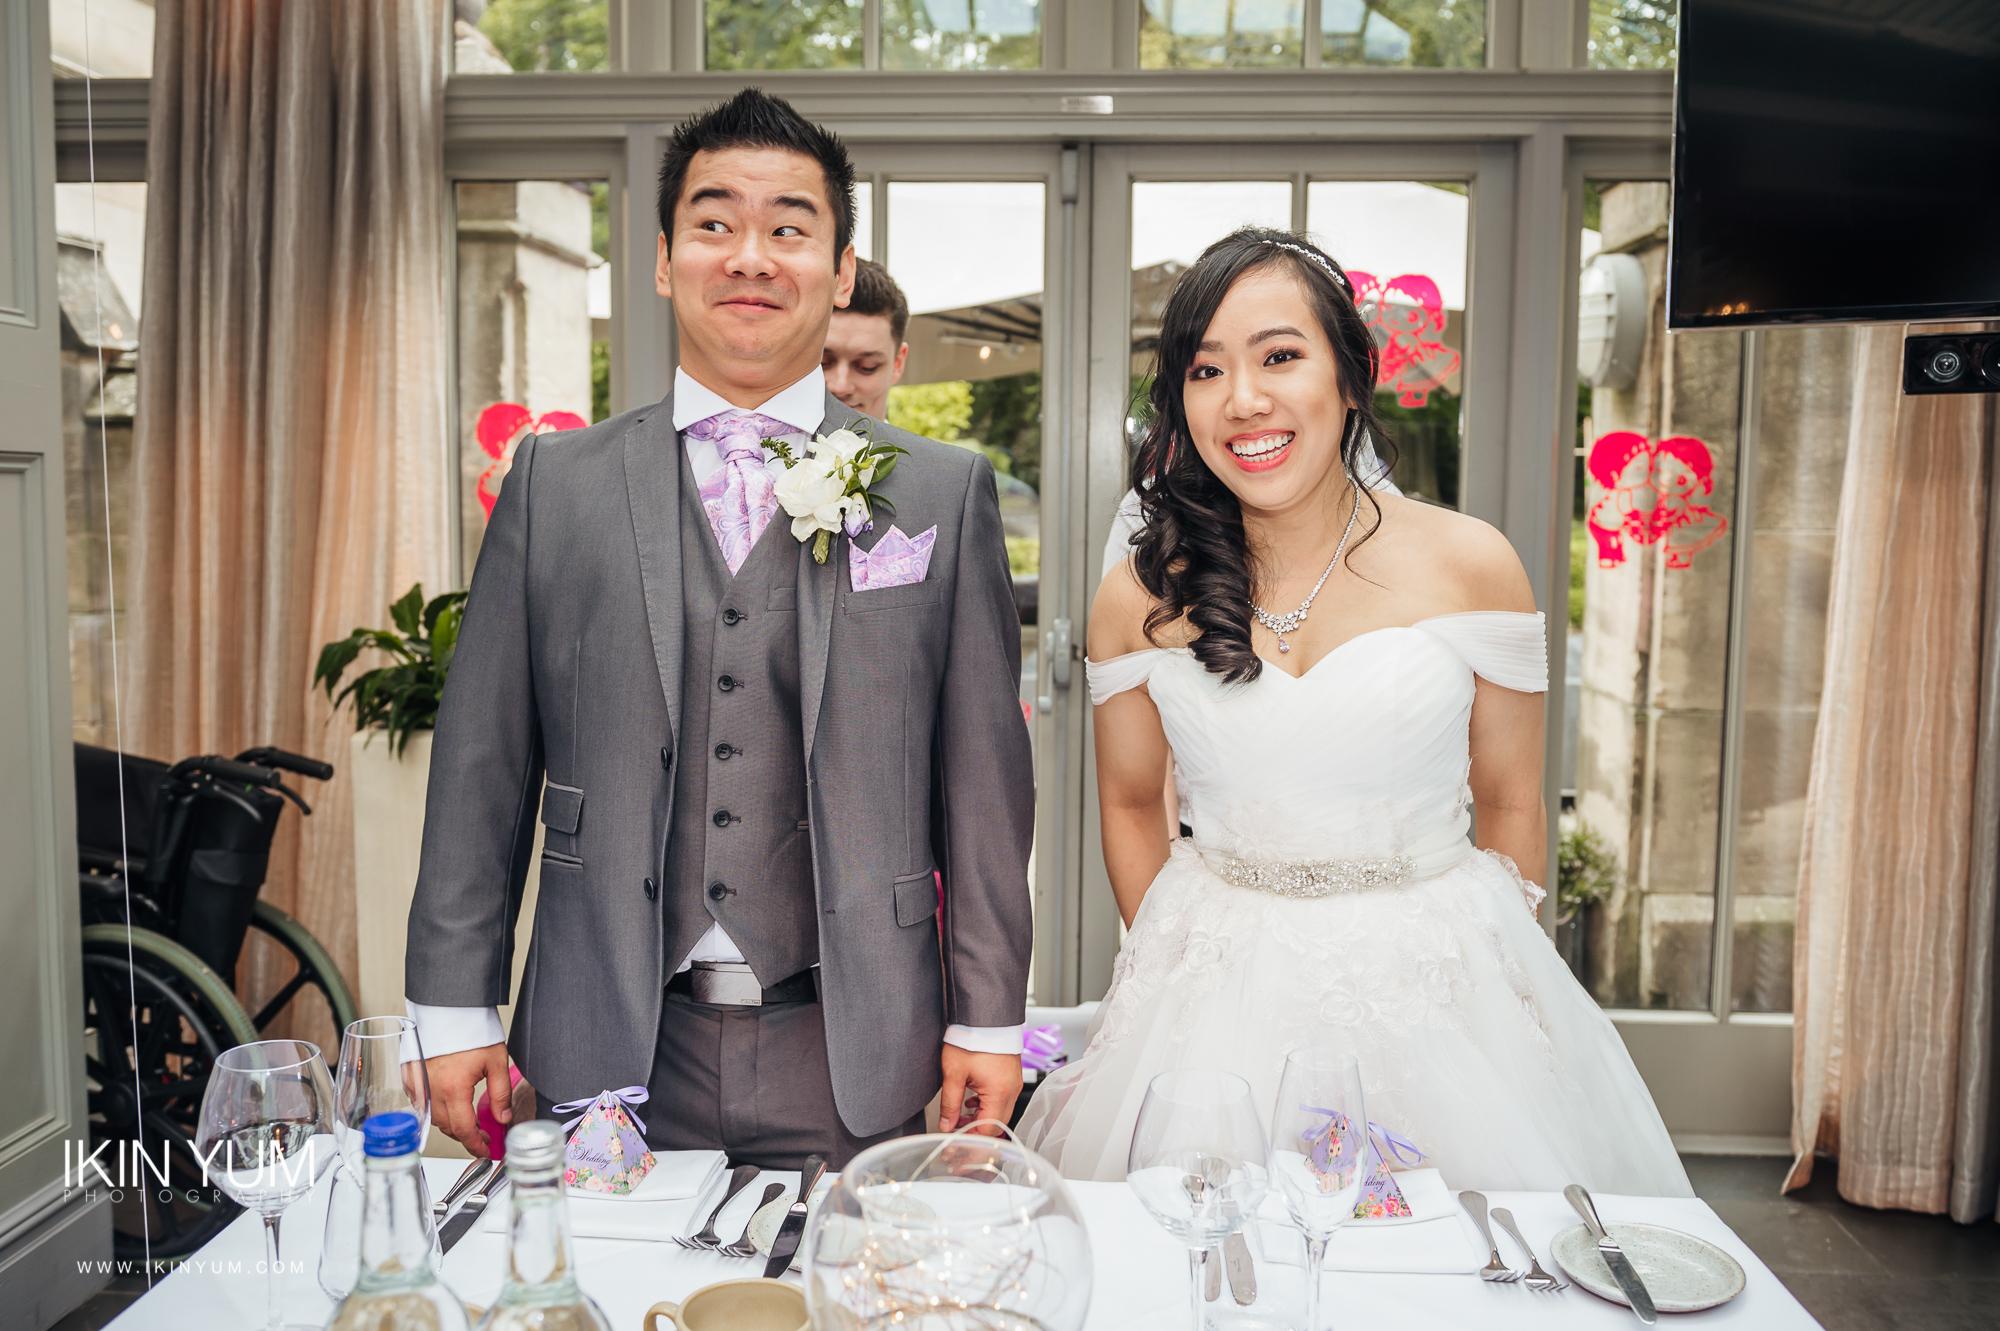 Hampton Manor Wedding - Ikin Yum Photography -126.jpg